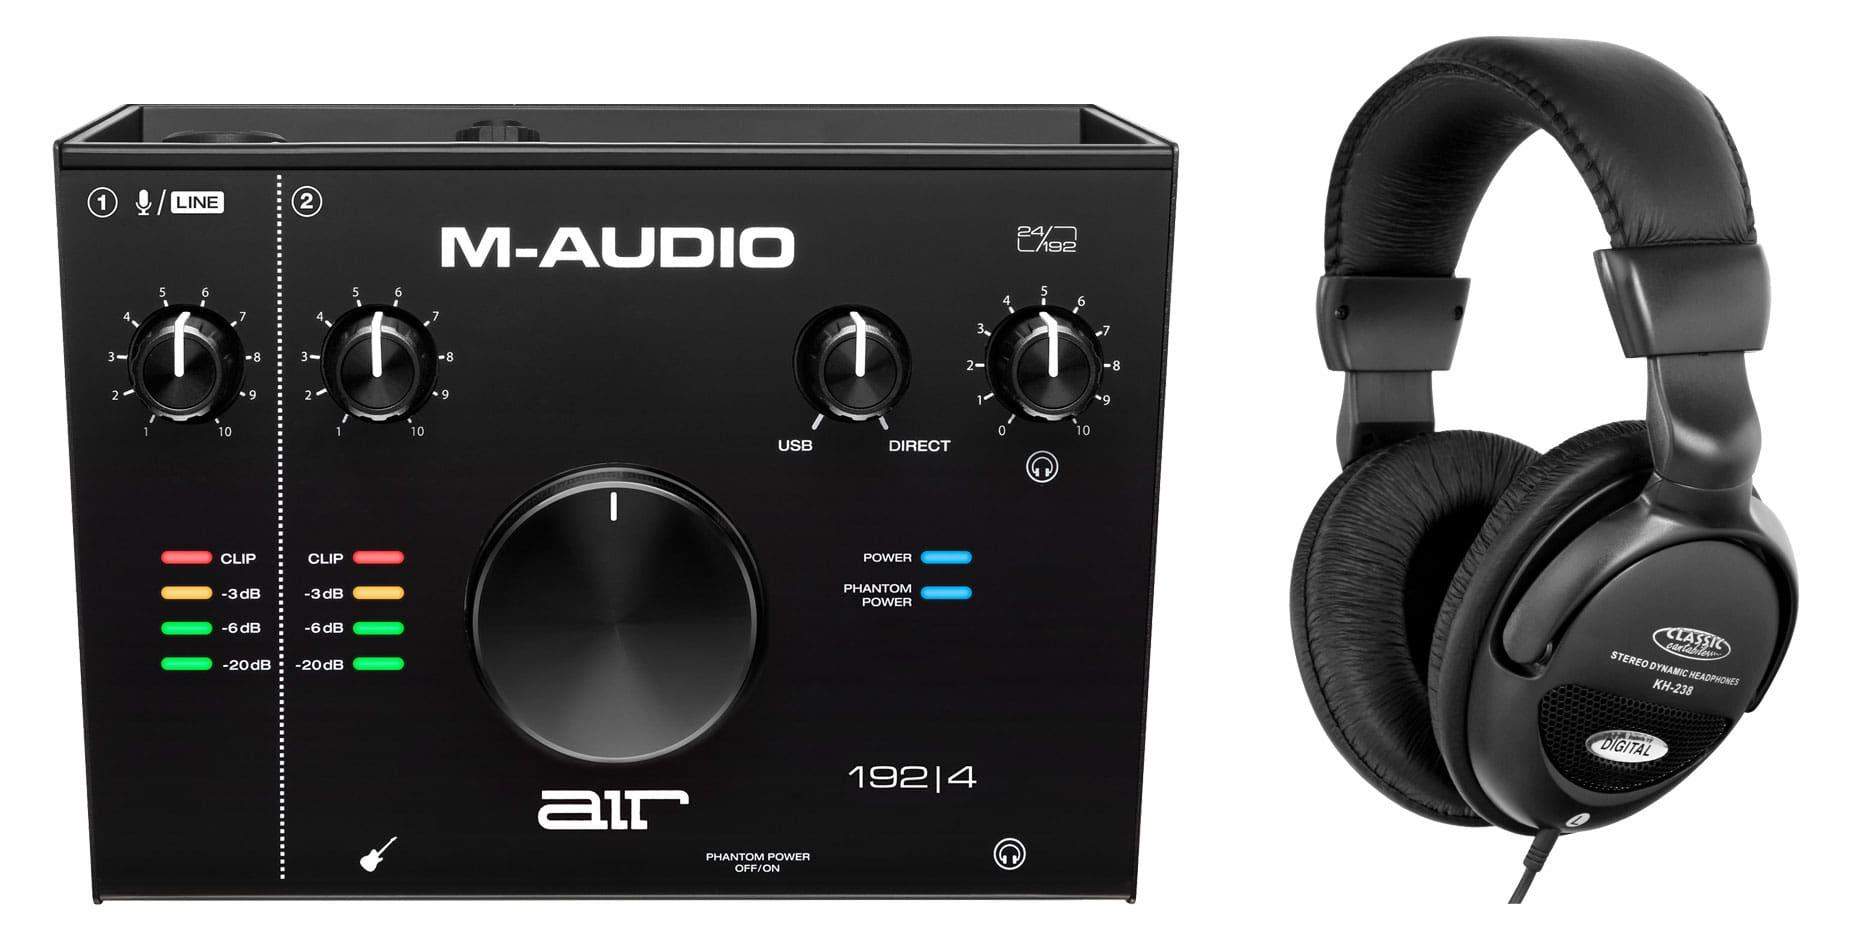 Pchardware - M Audio AIR 192 4 Interface Set - Onlineshop Musikhaus Kirstein